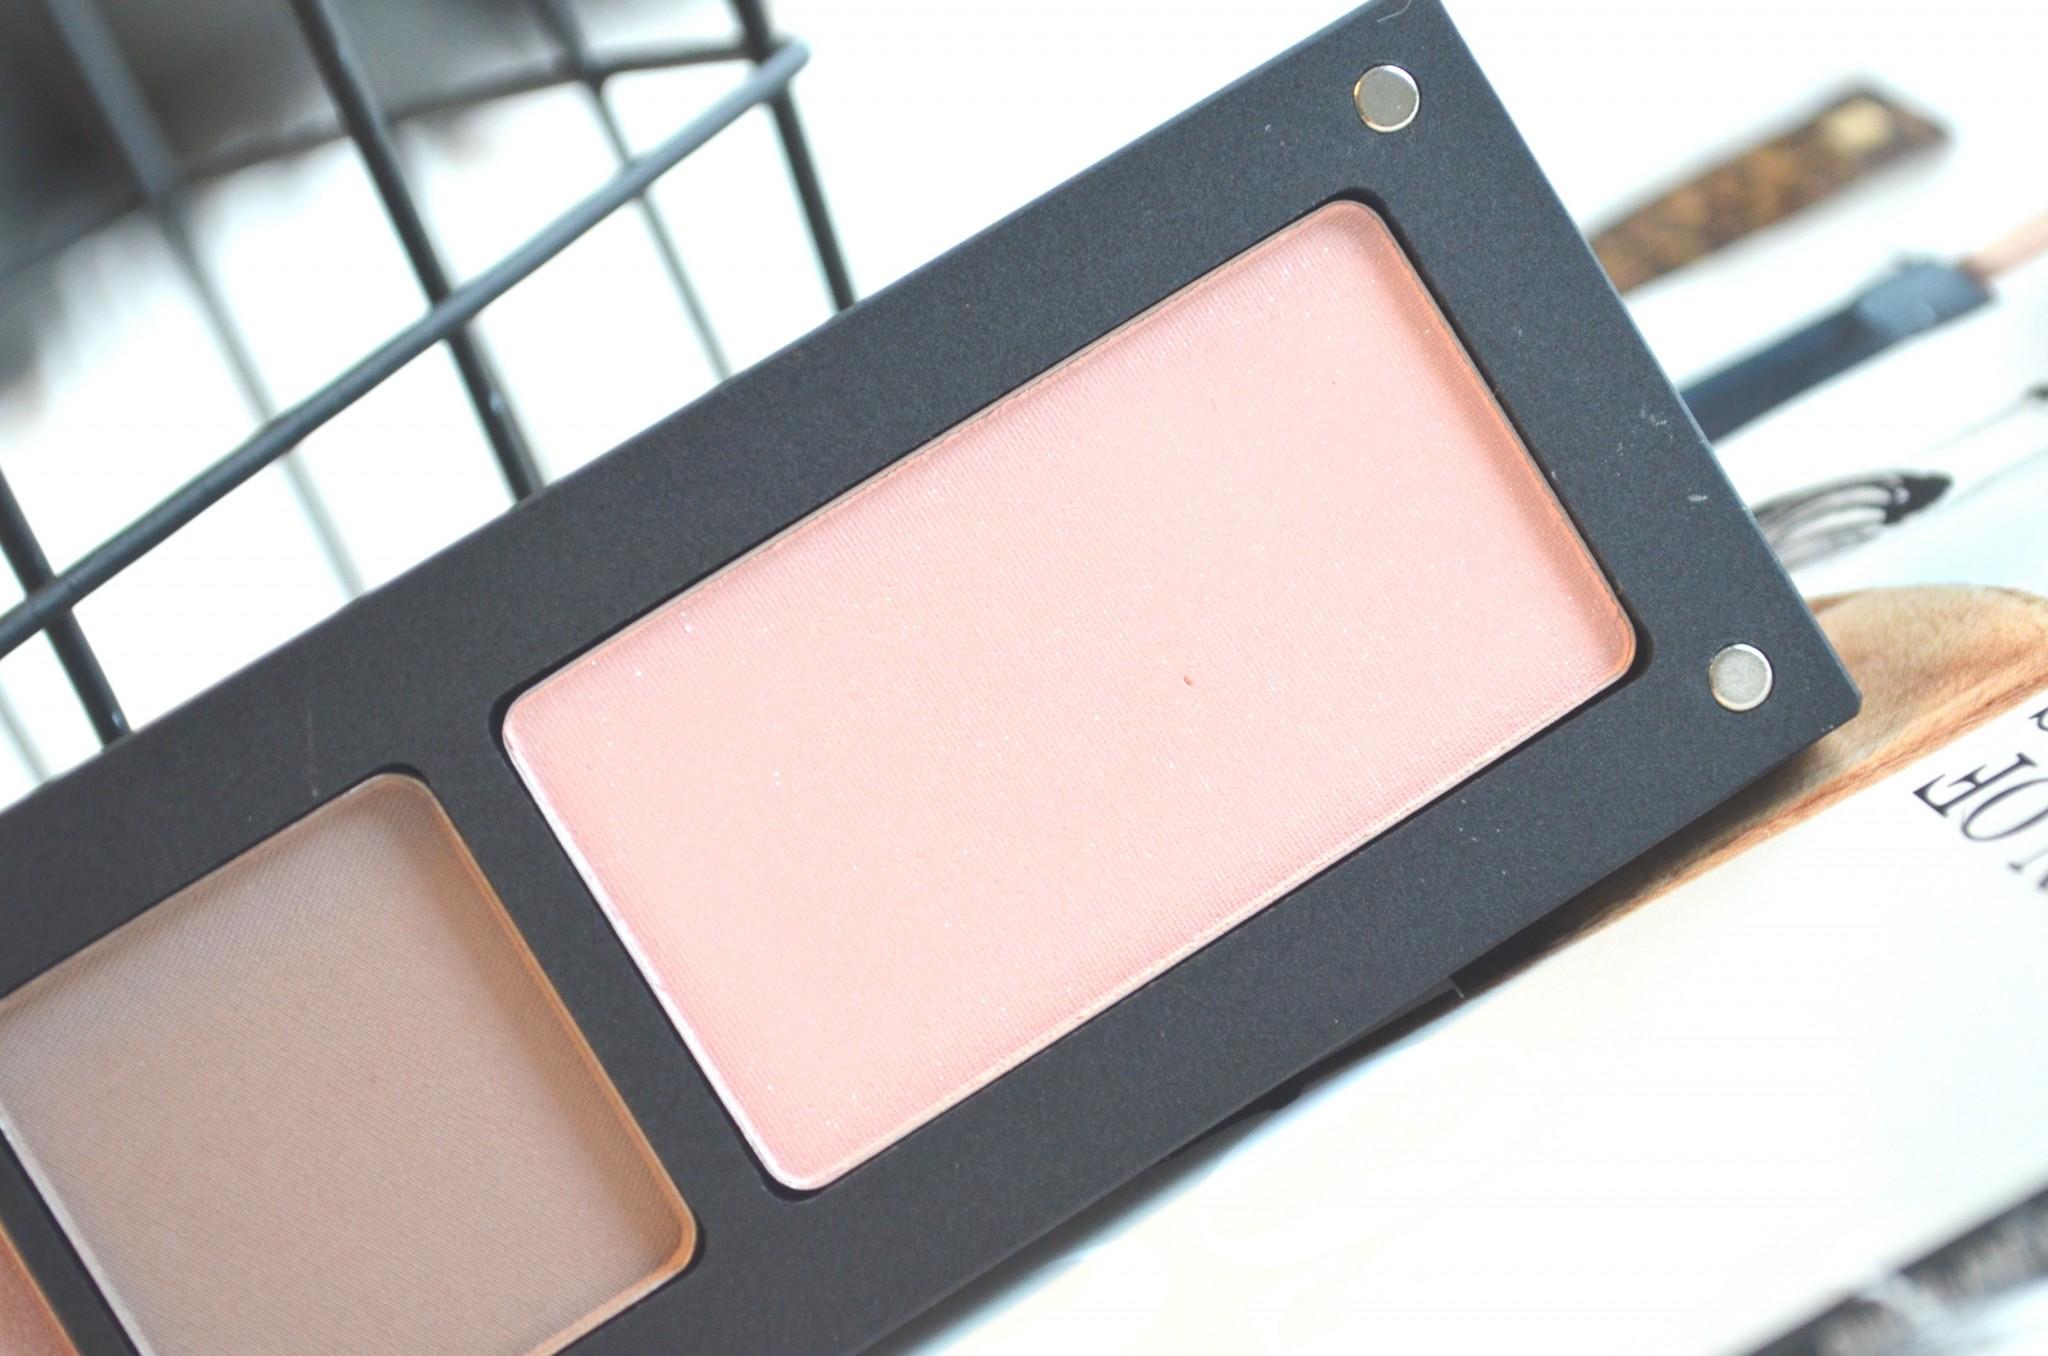 DSC 2064 1 - Nieuwe Inglot Freedom System Eyeshadow + Blush